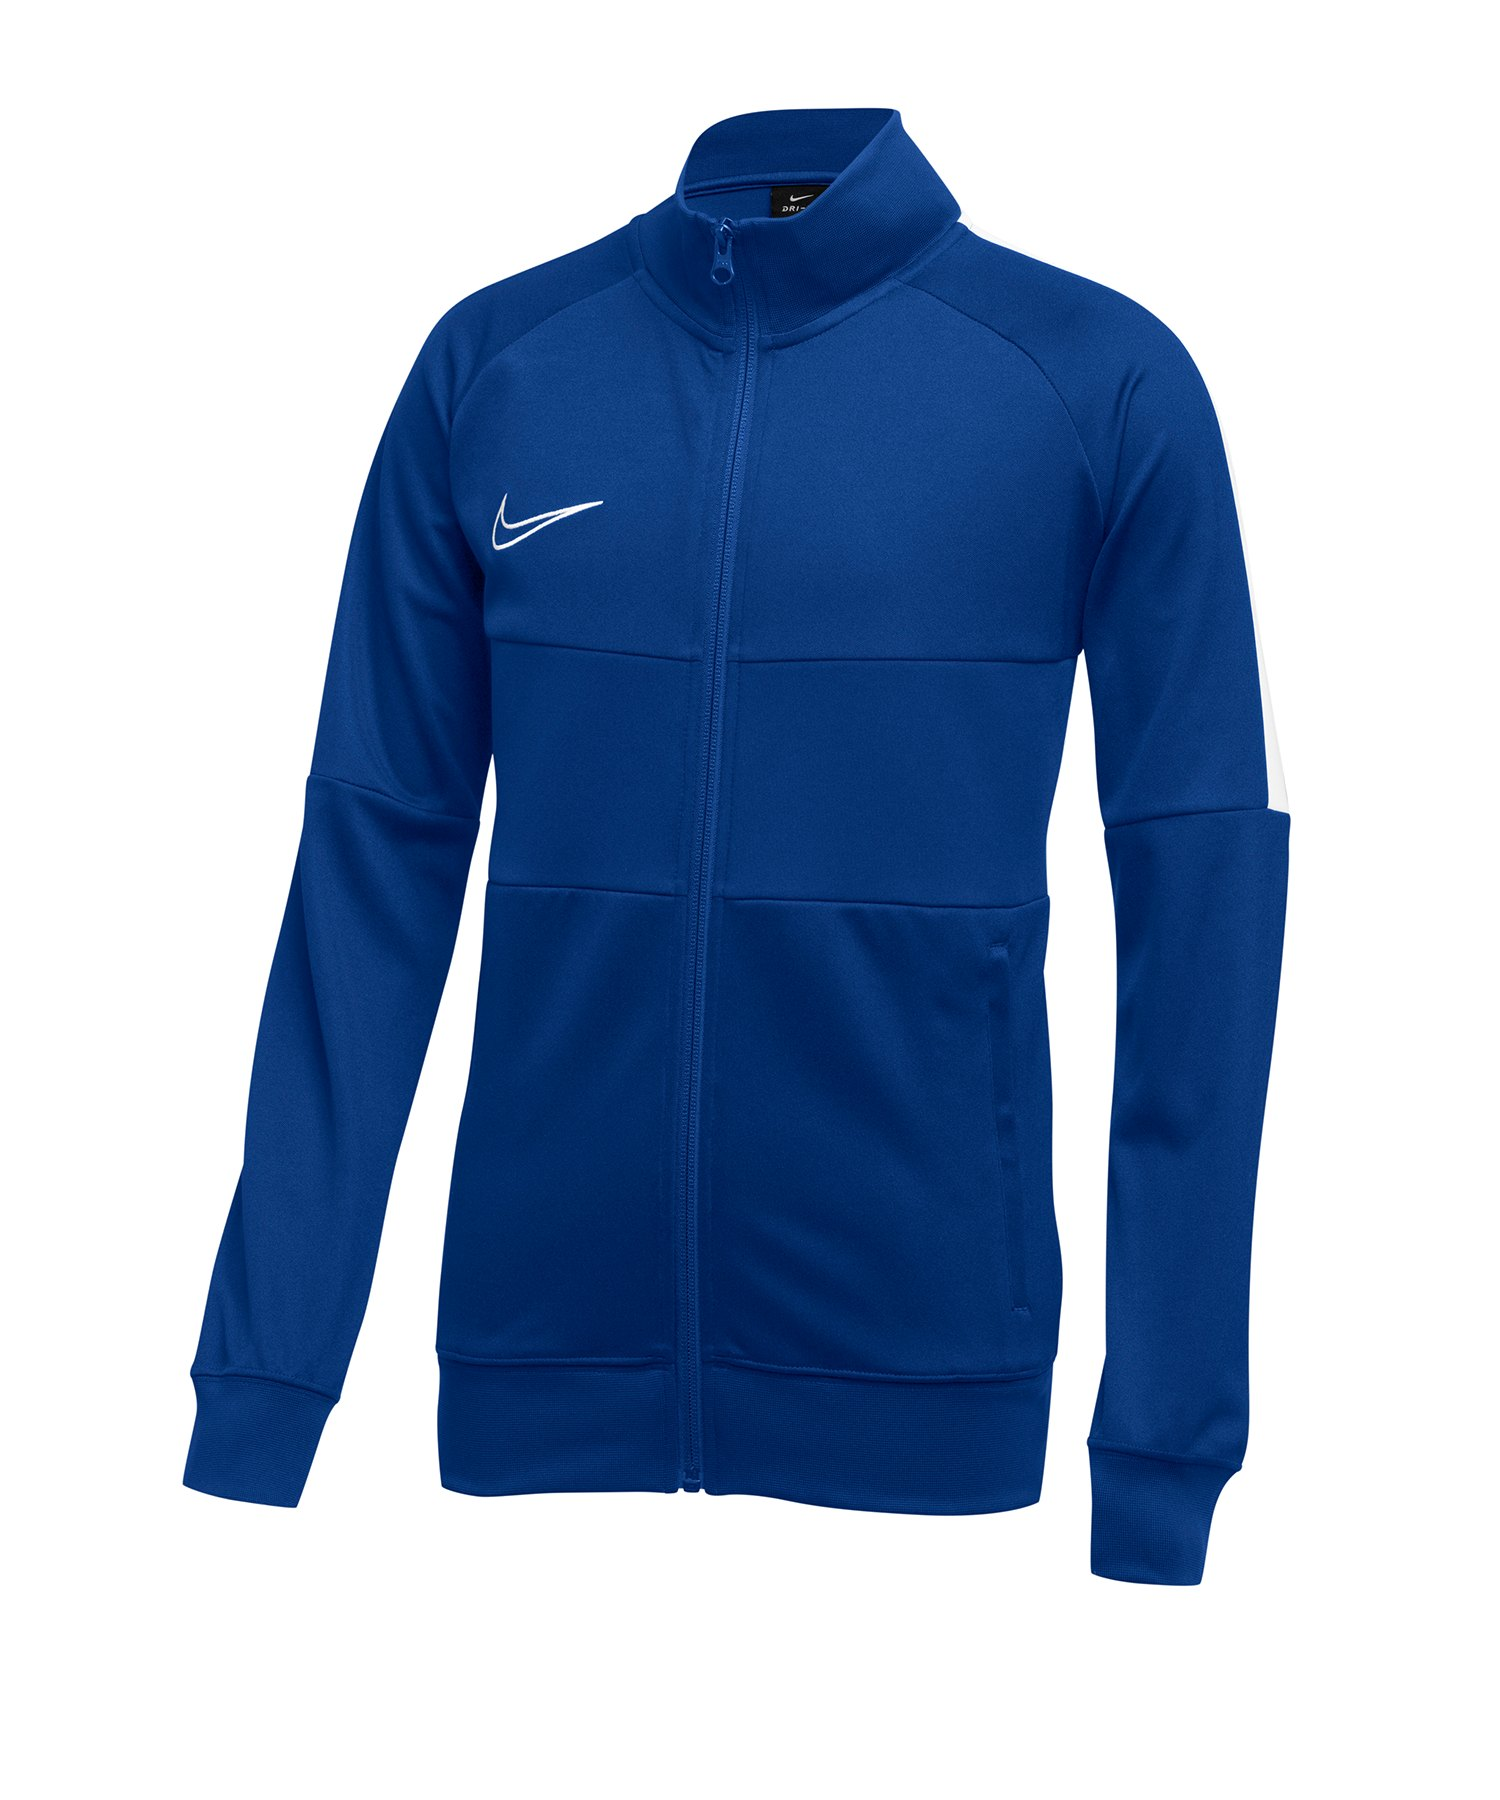 Nike Academy 19 Dri-FIT Jacke Kids Blau F463 - Blau